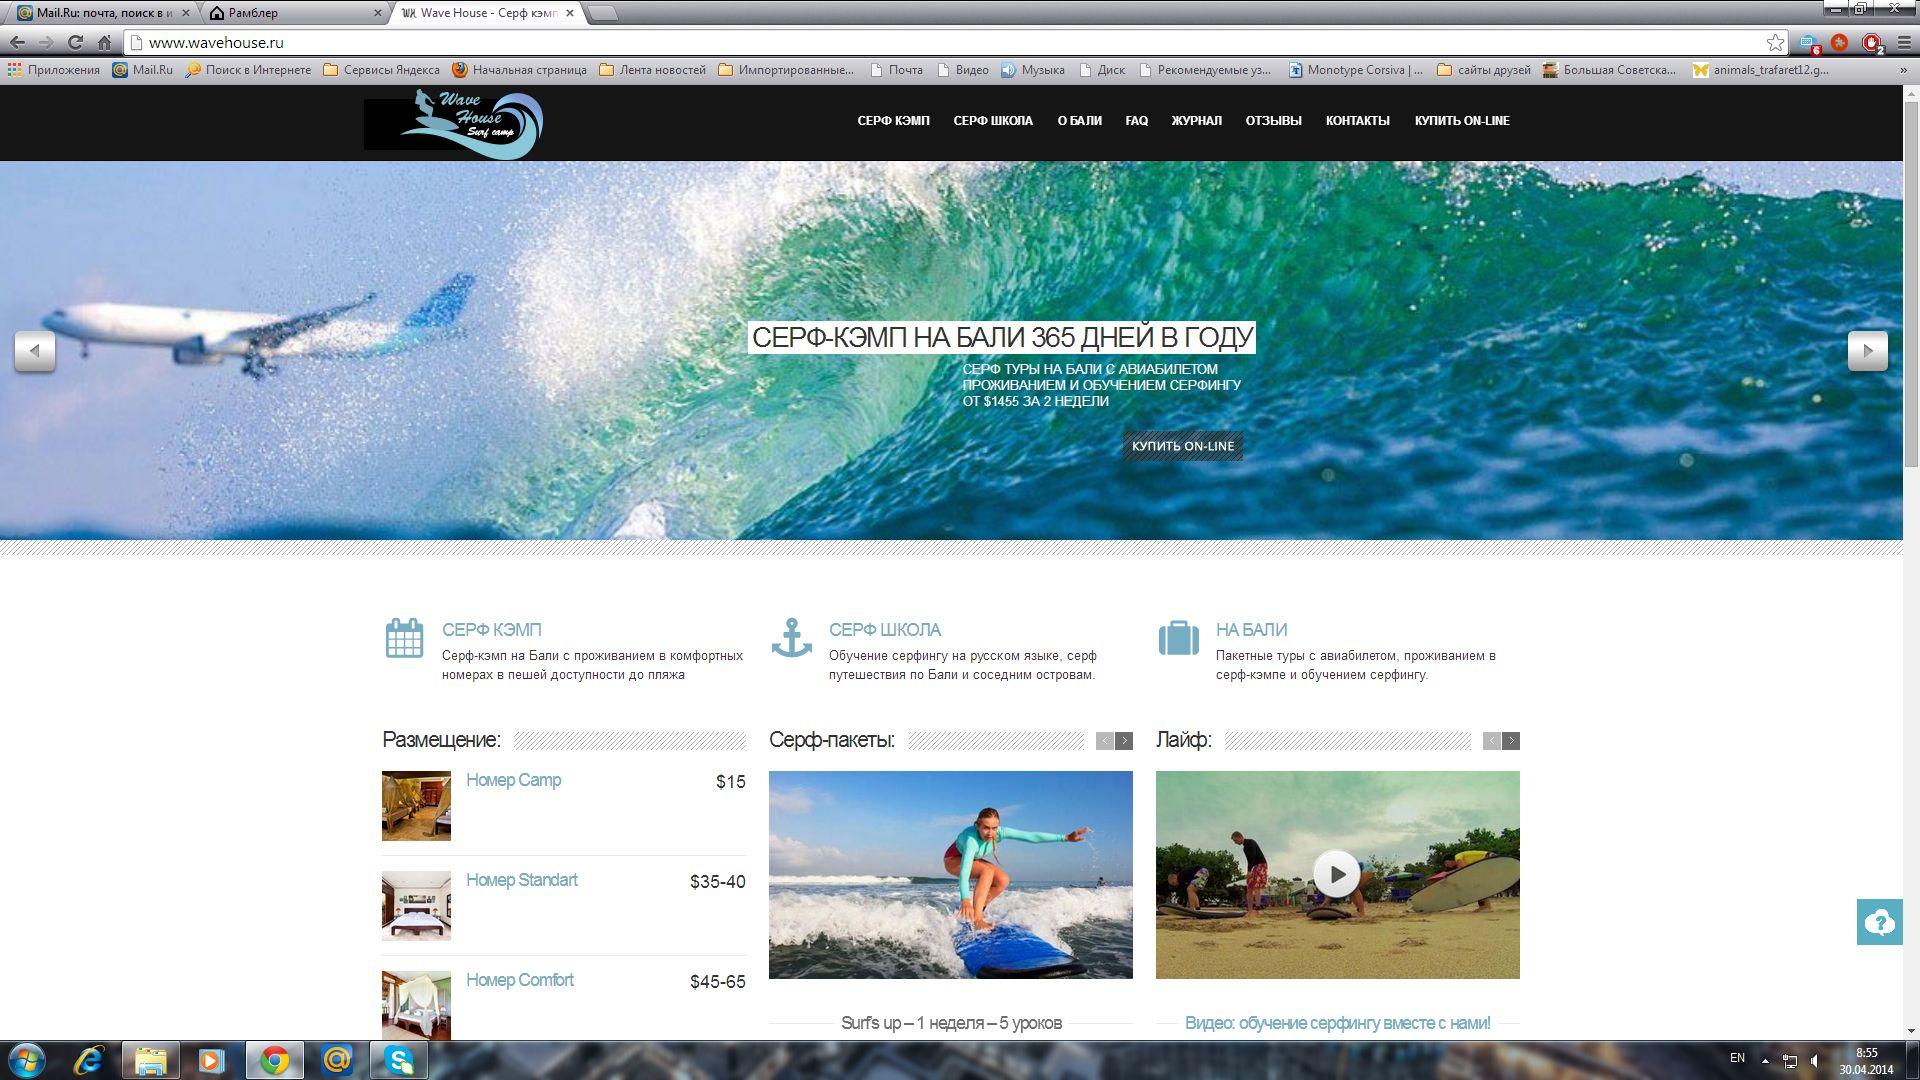 Редизайн логотипа для серф-кэмпа на Бали - дизайнер reno_22